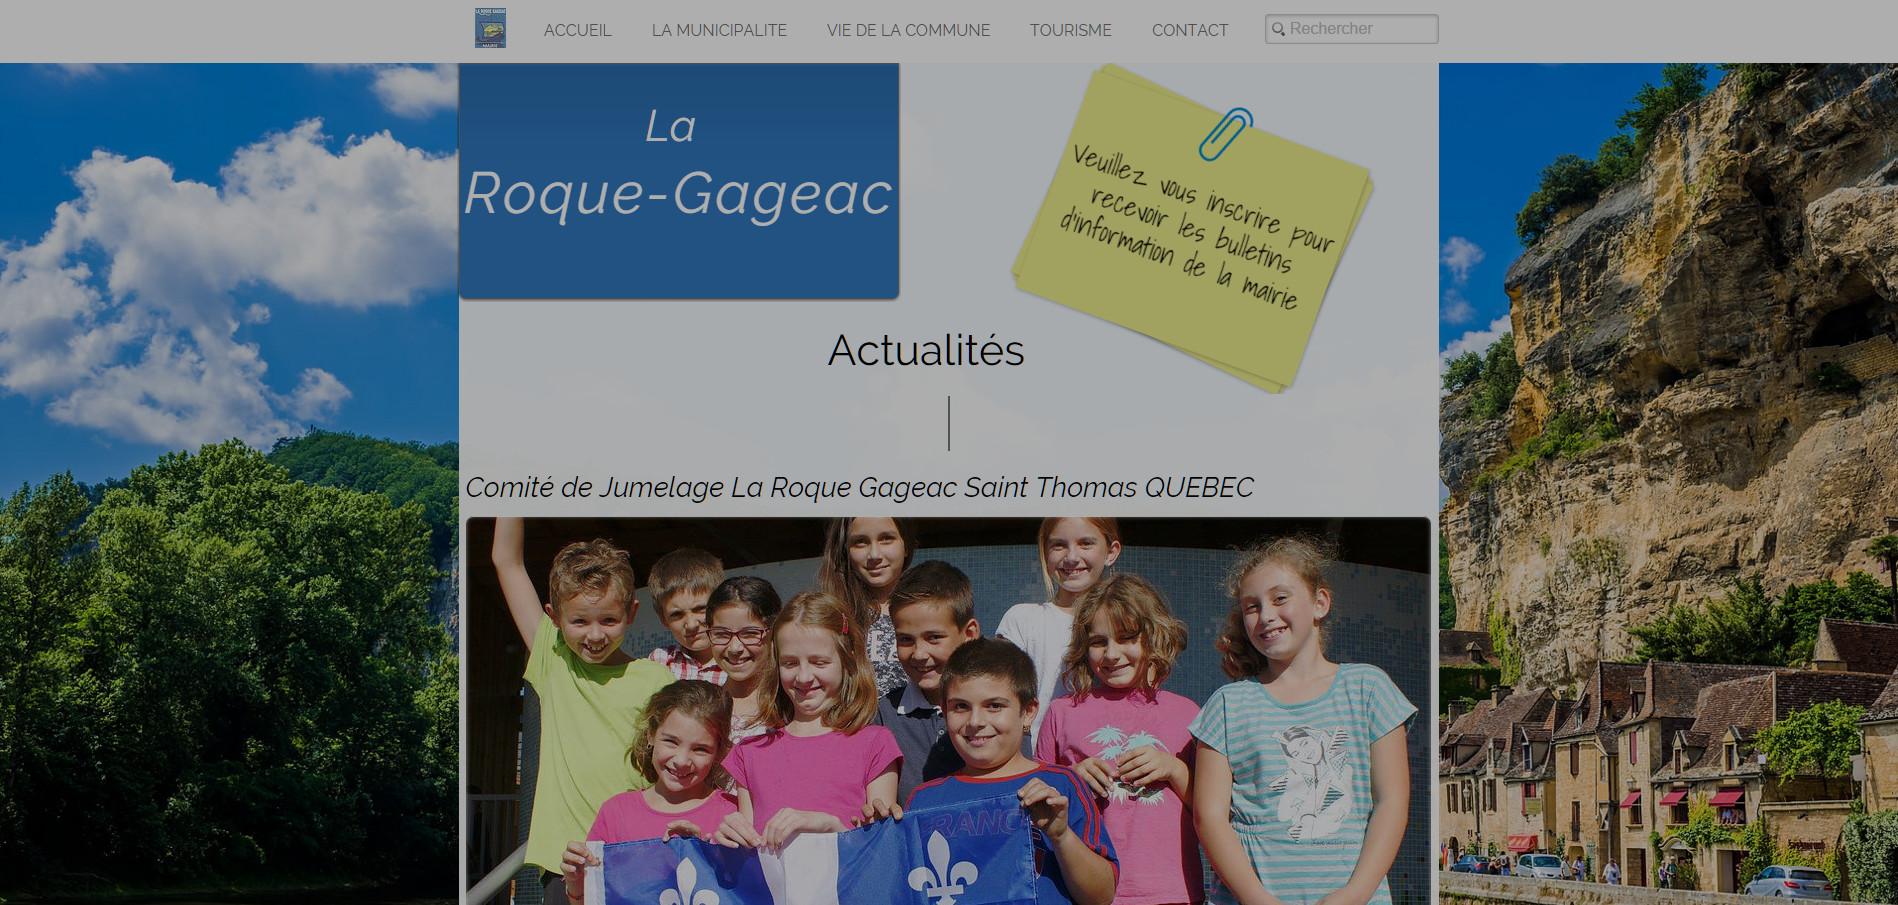 MAIRIE DE LA ROQUE GAGEAC